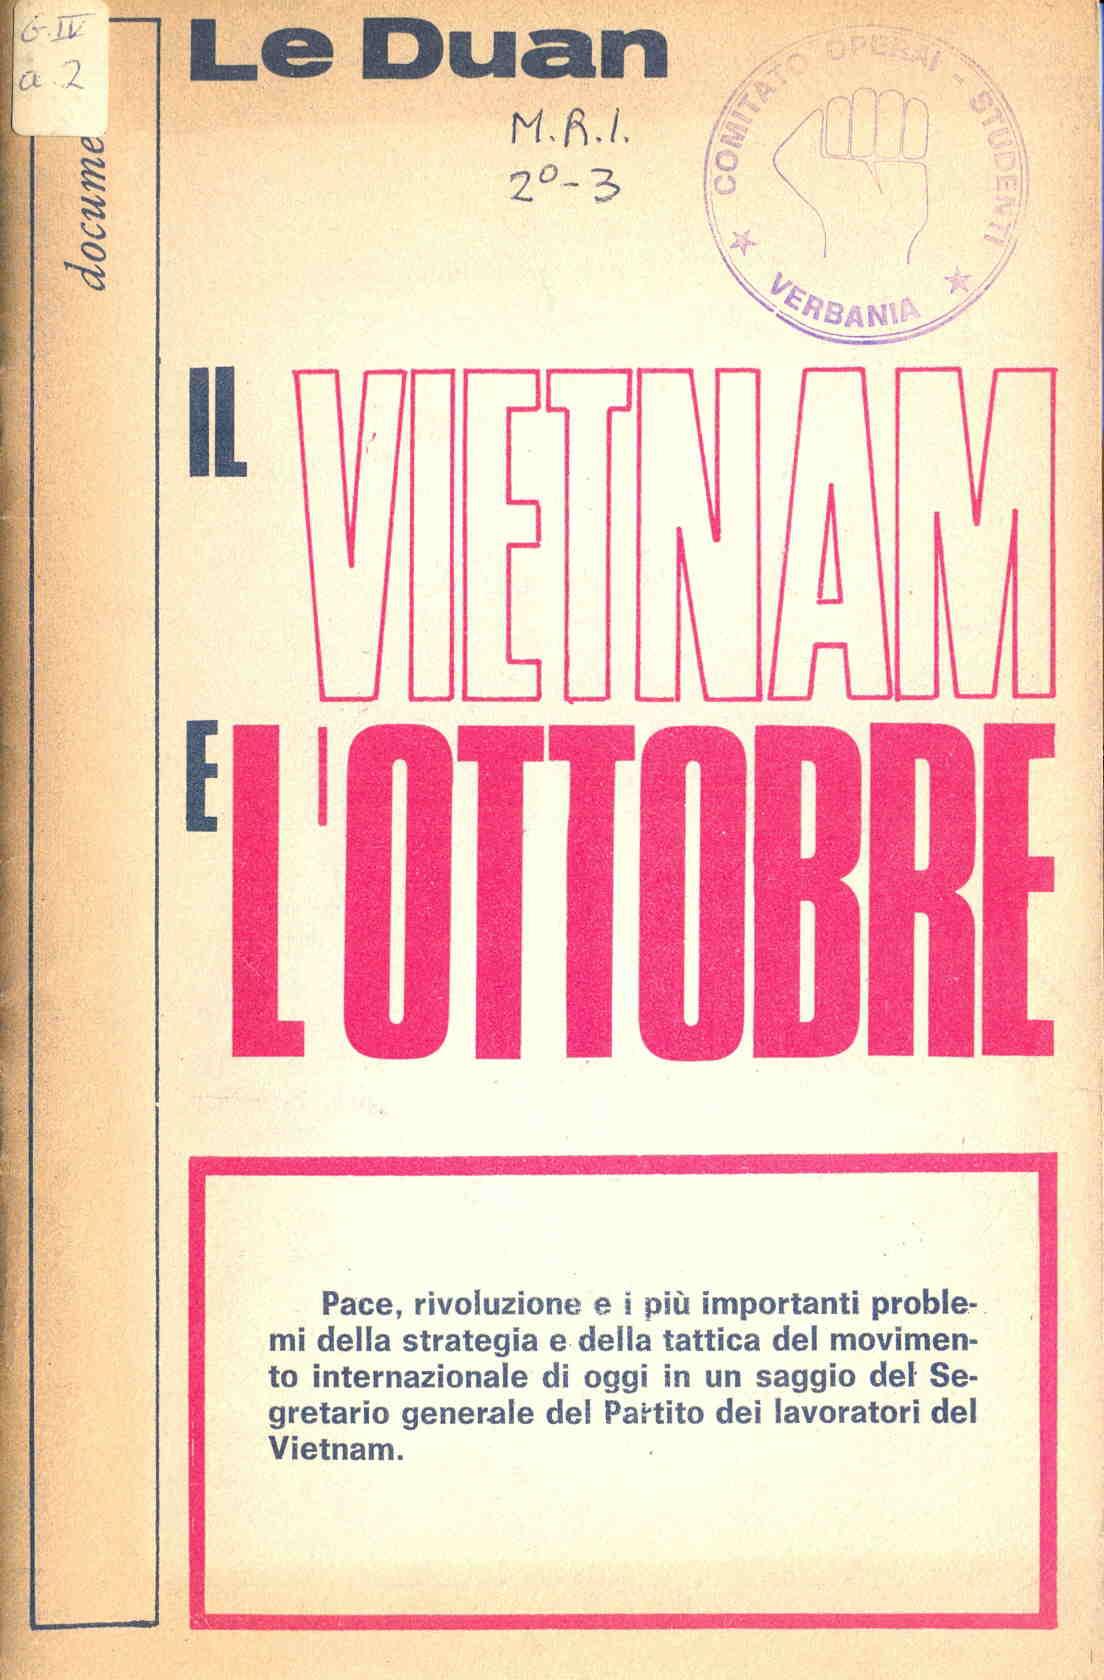 Il Vietnam e l'ottobre